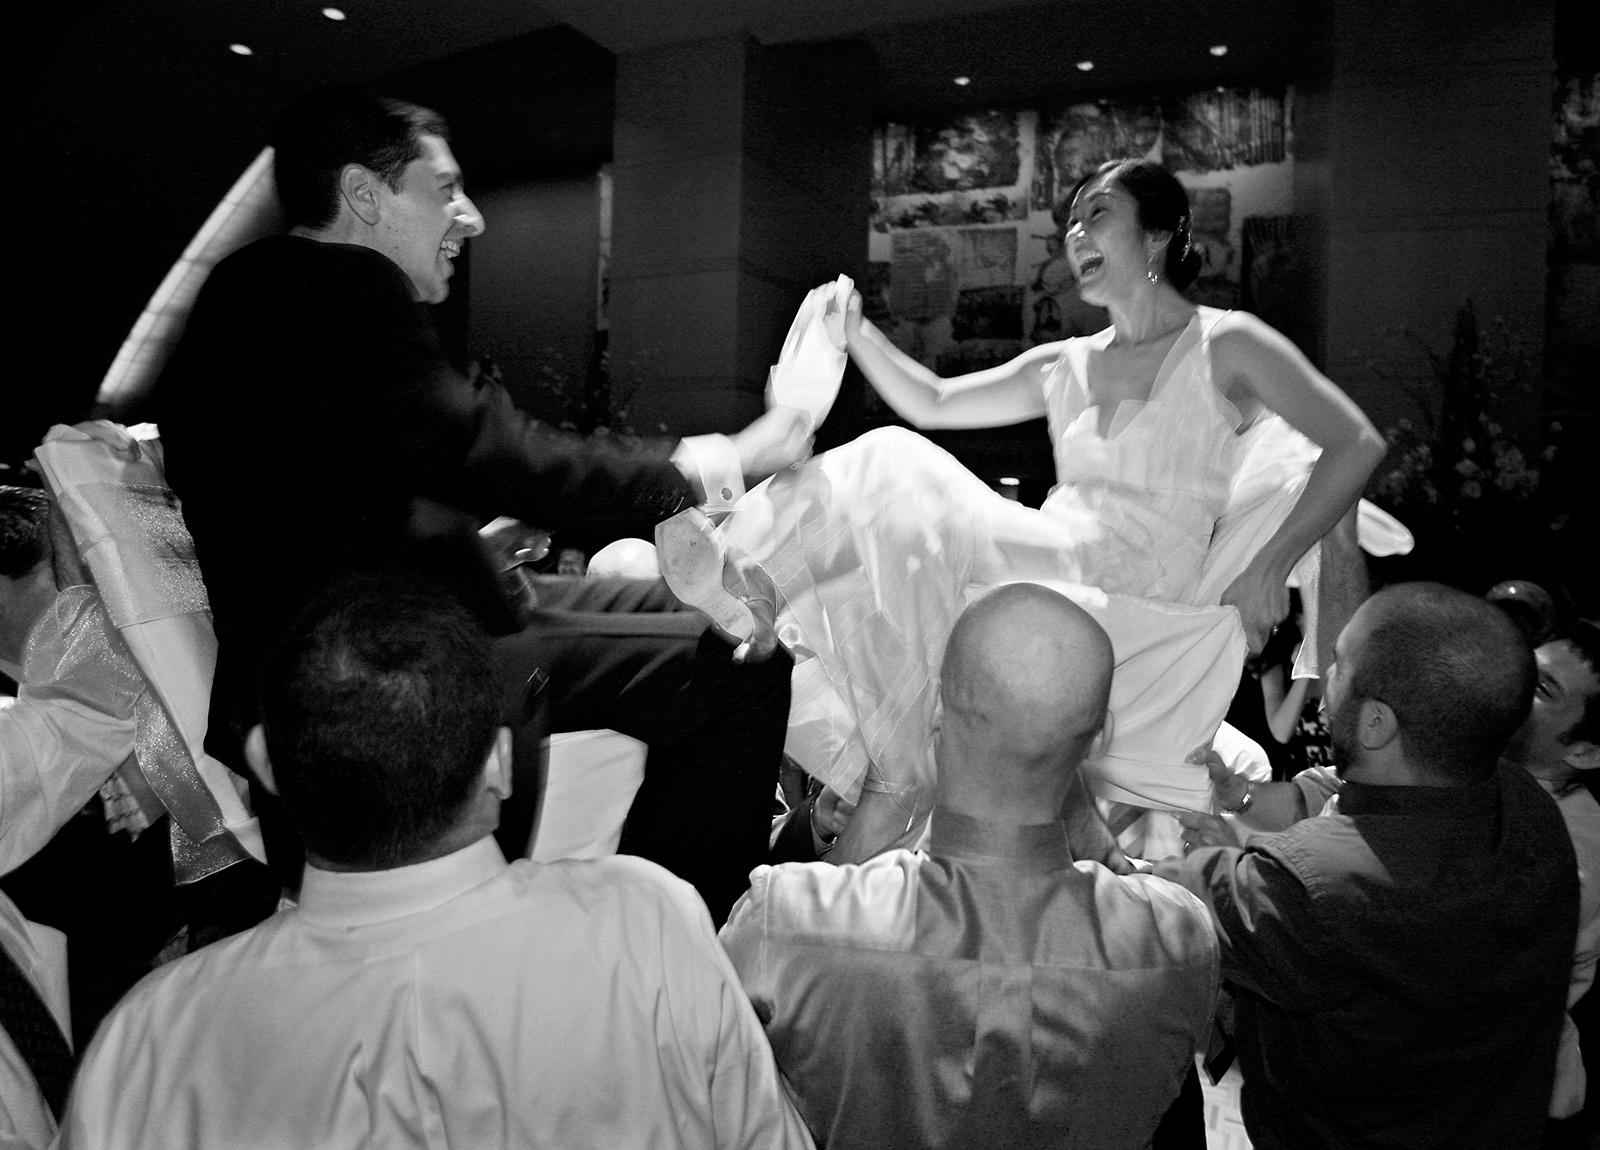 Wurzer_Weddings_0253